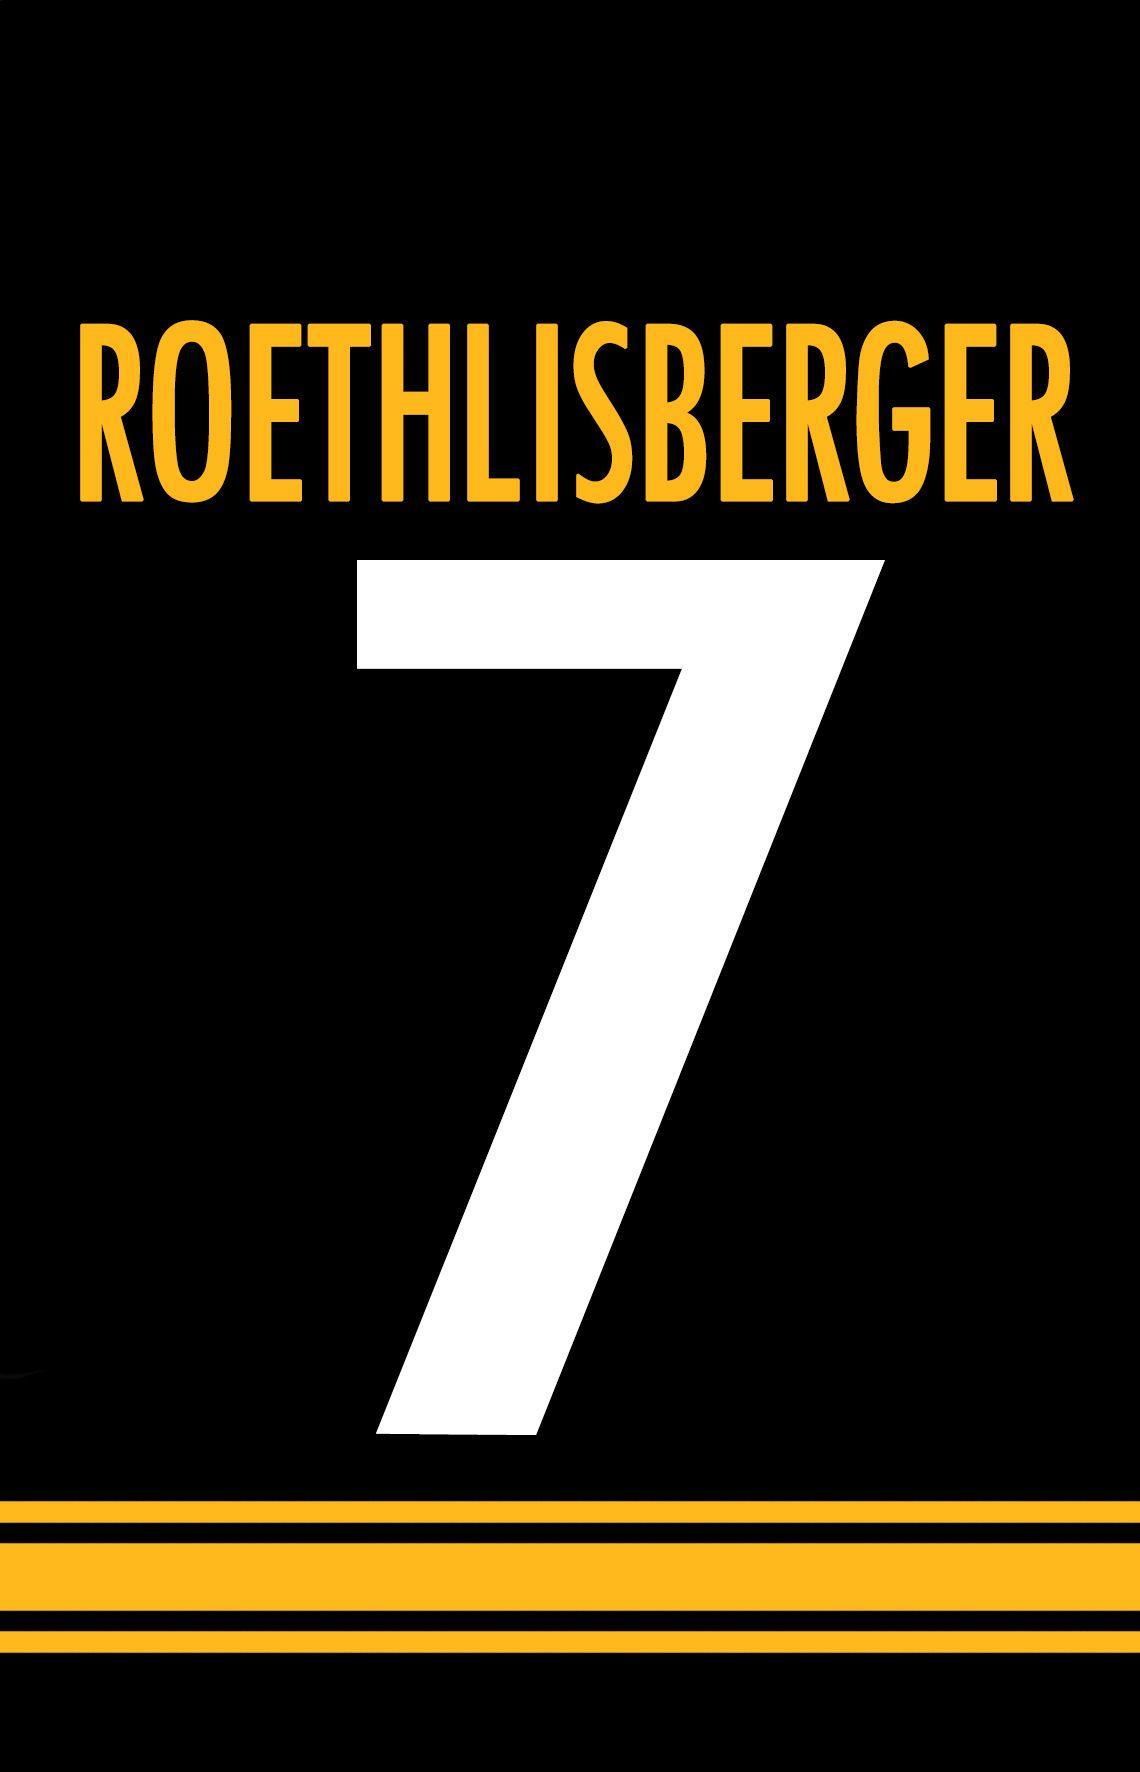 c172331d9d6 Big Ben Roethlisberger 7 Pittsburgh Steelers Nation Iphone Wallpaper ...